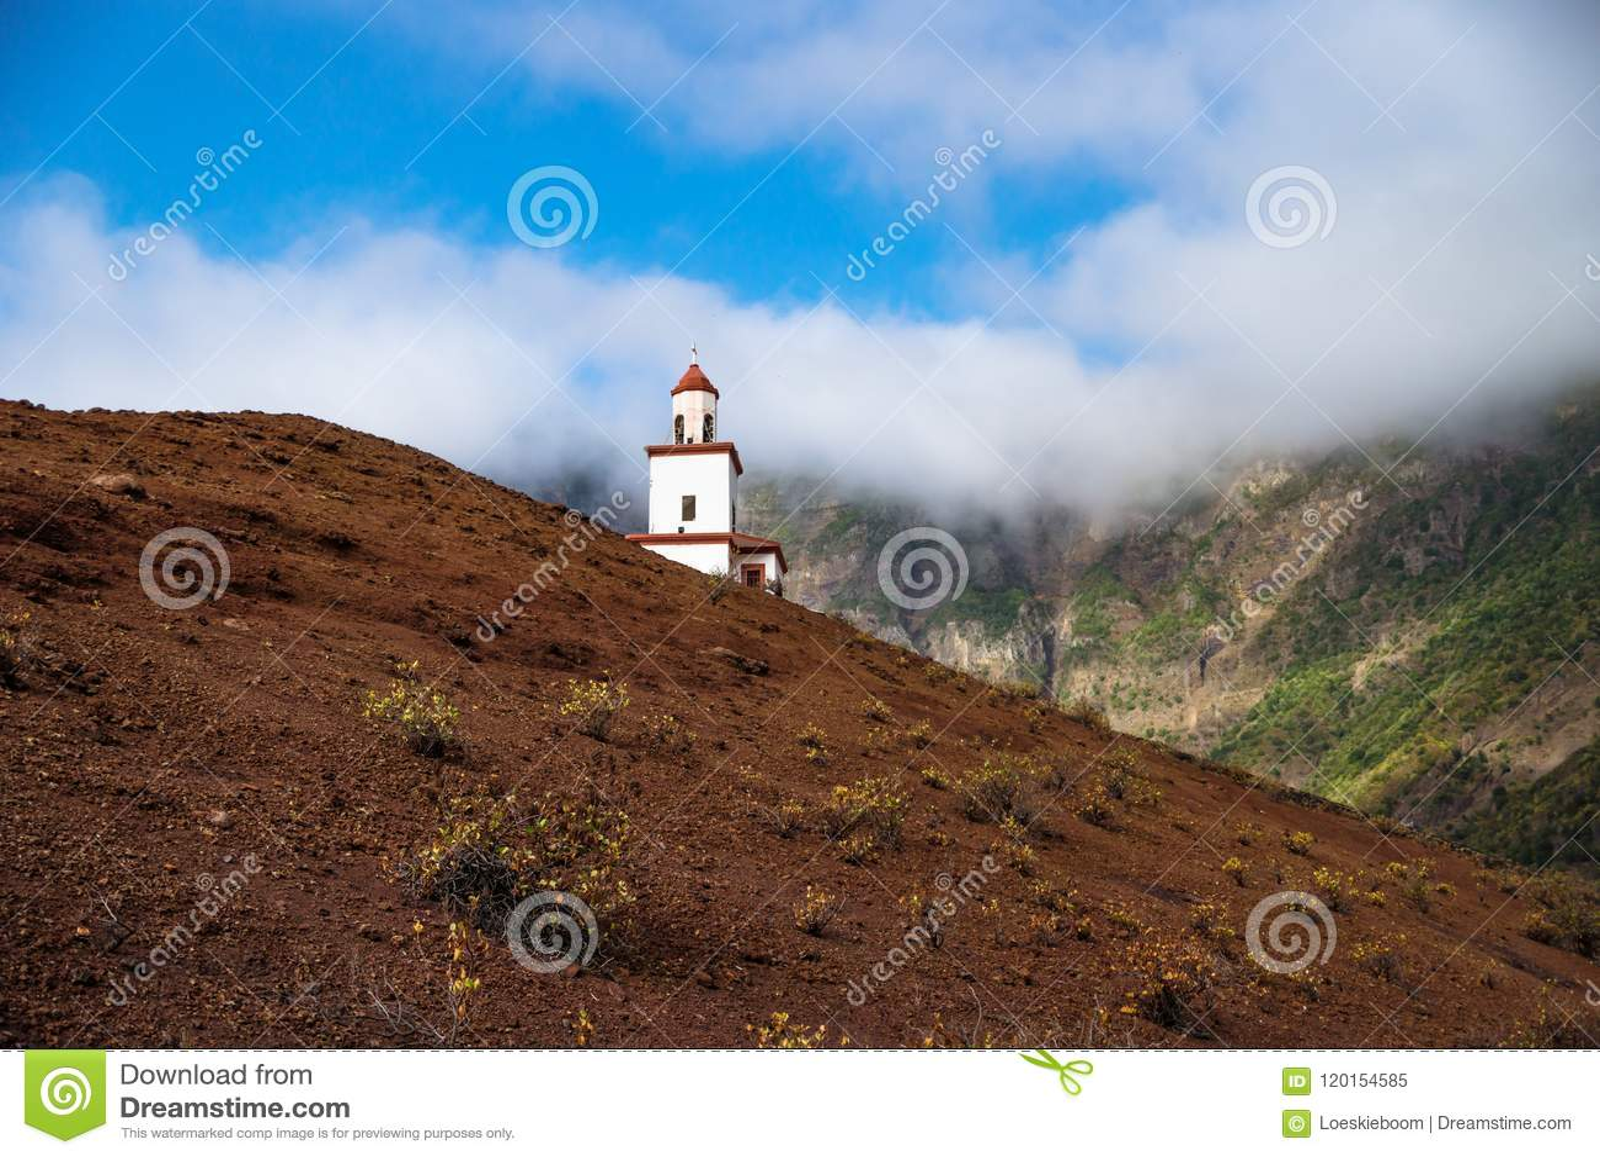 The church La Candelaria on a slooped red hill, Frontera, El Golfo, El Hierro, Canary Islands, Spain